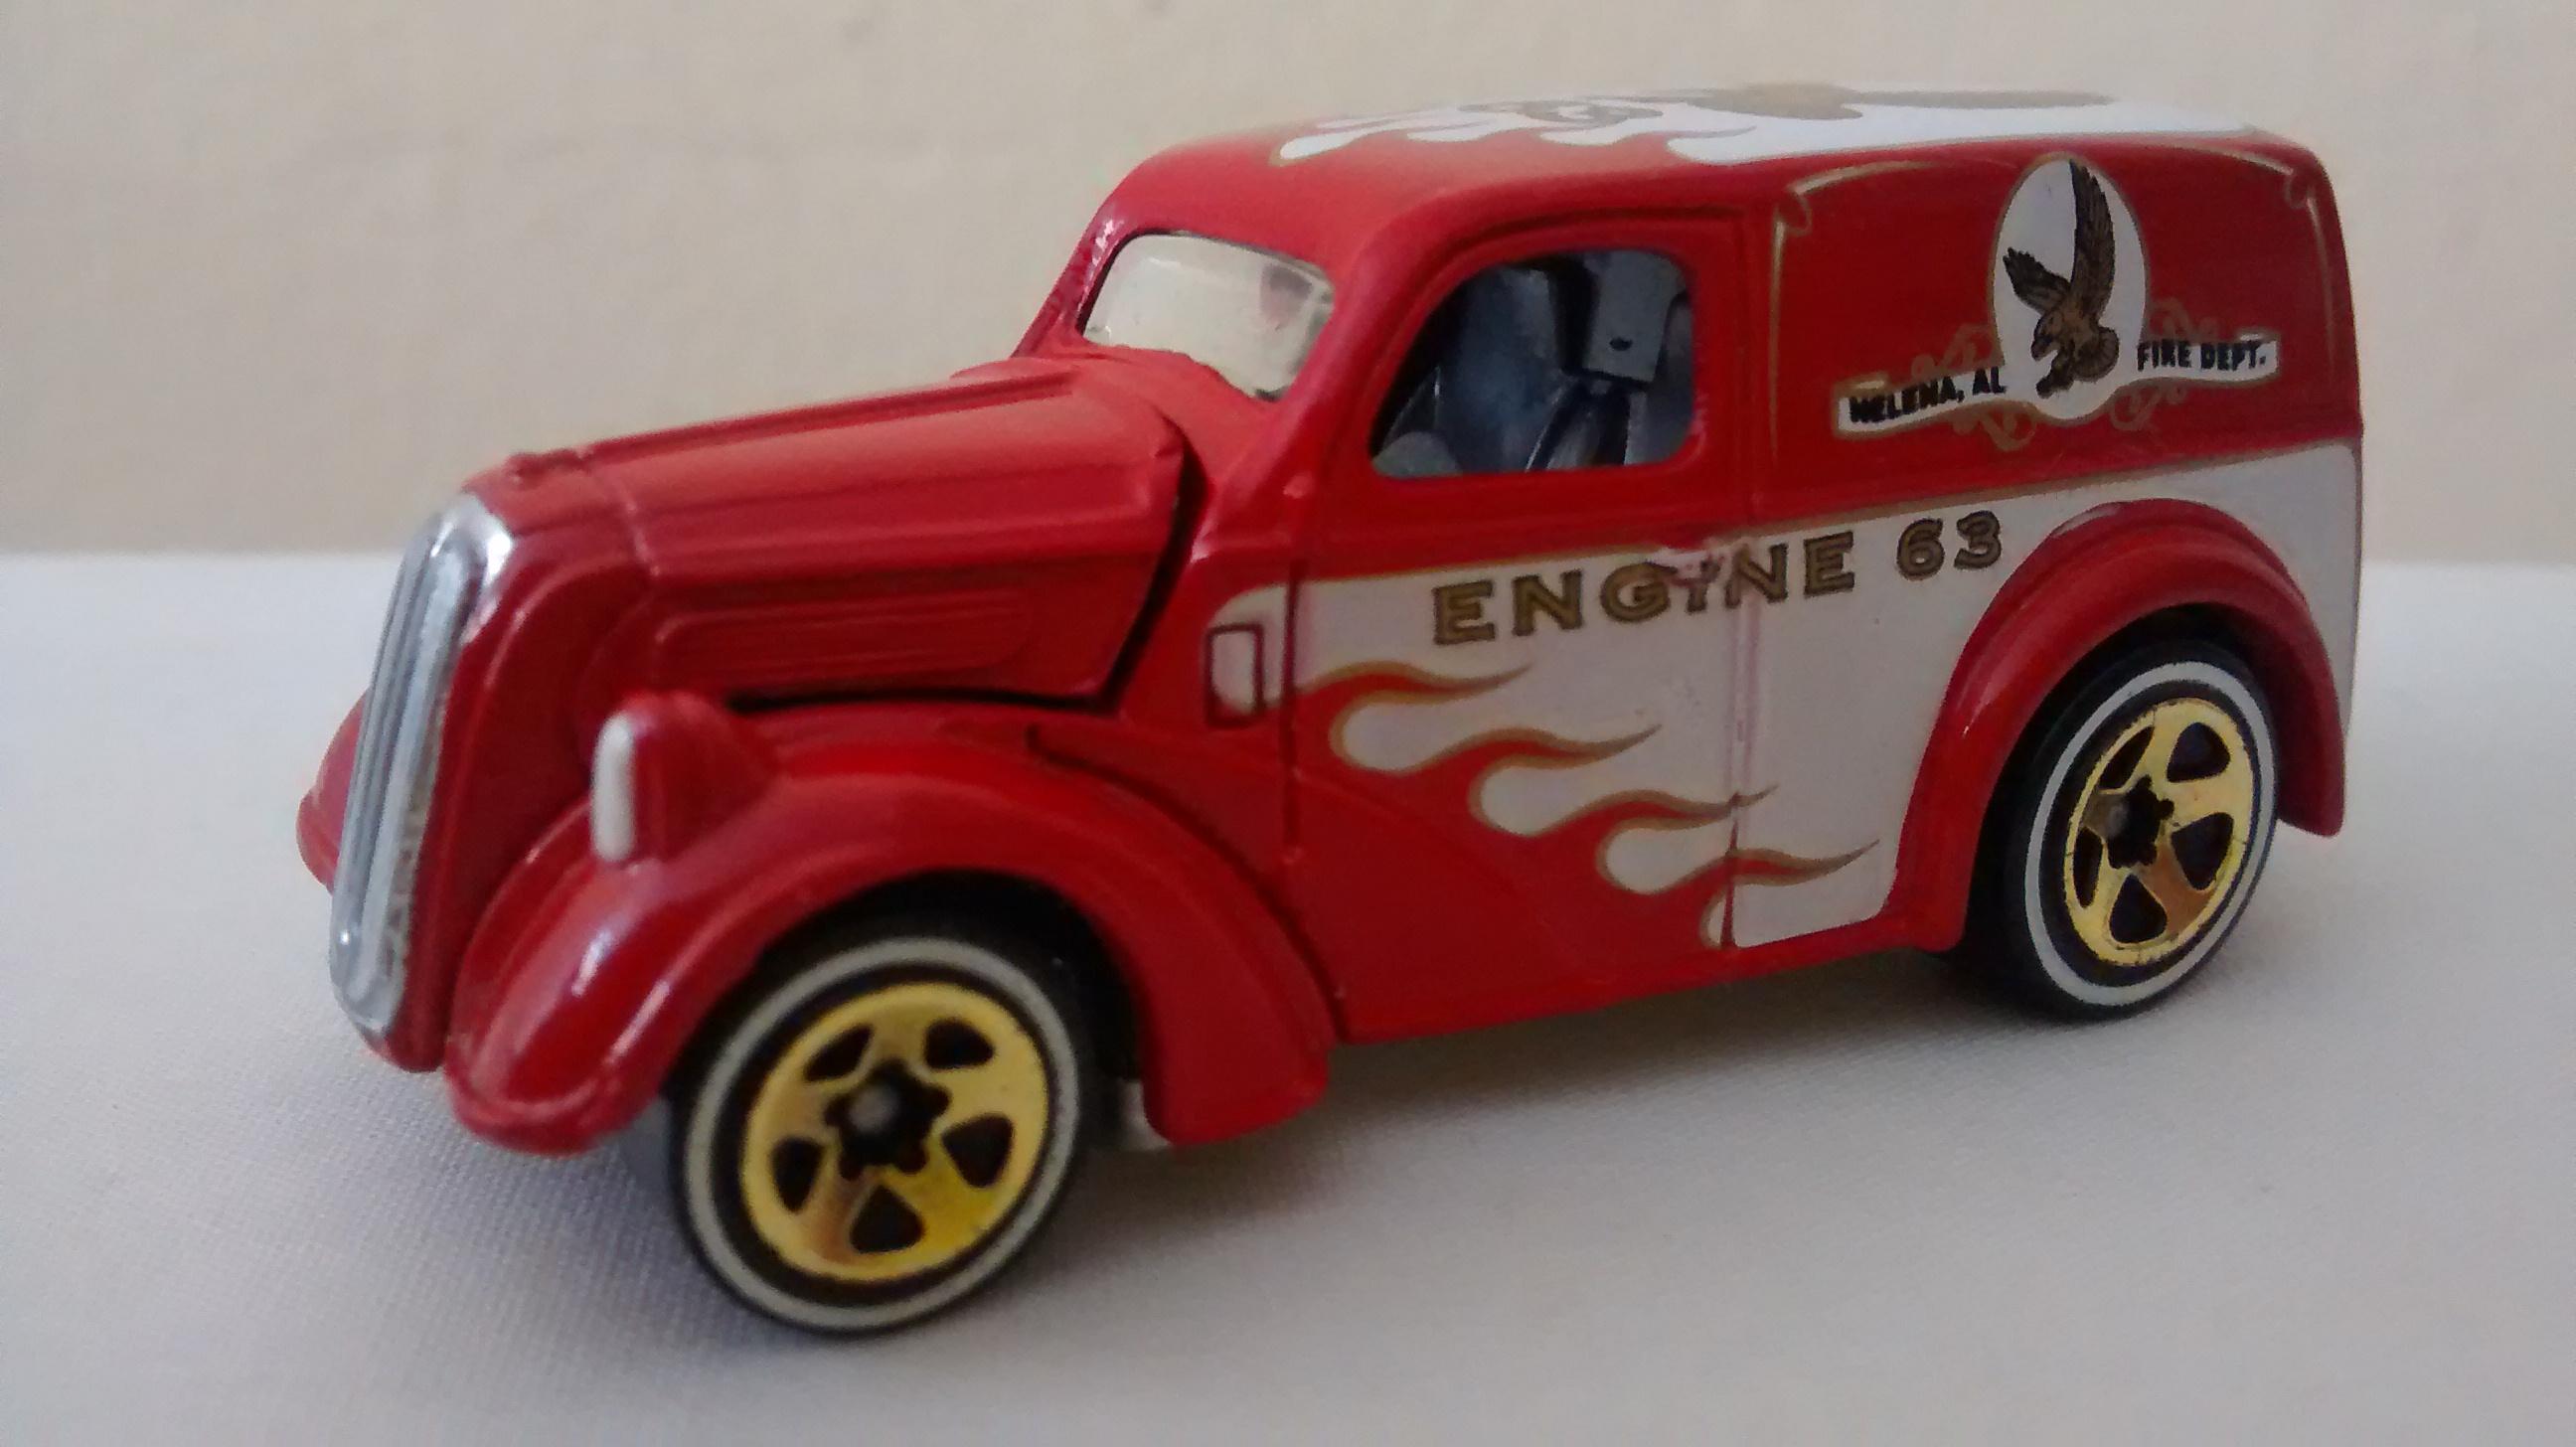 Anglia Panel Truck Hot Wheels Wiki Fandom Powered By Wikia 1949 Dodge Van